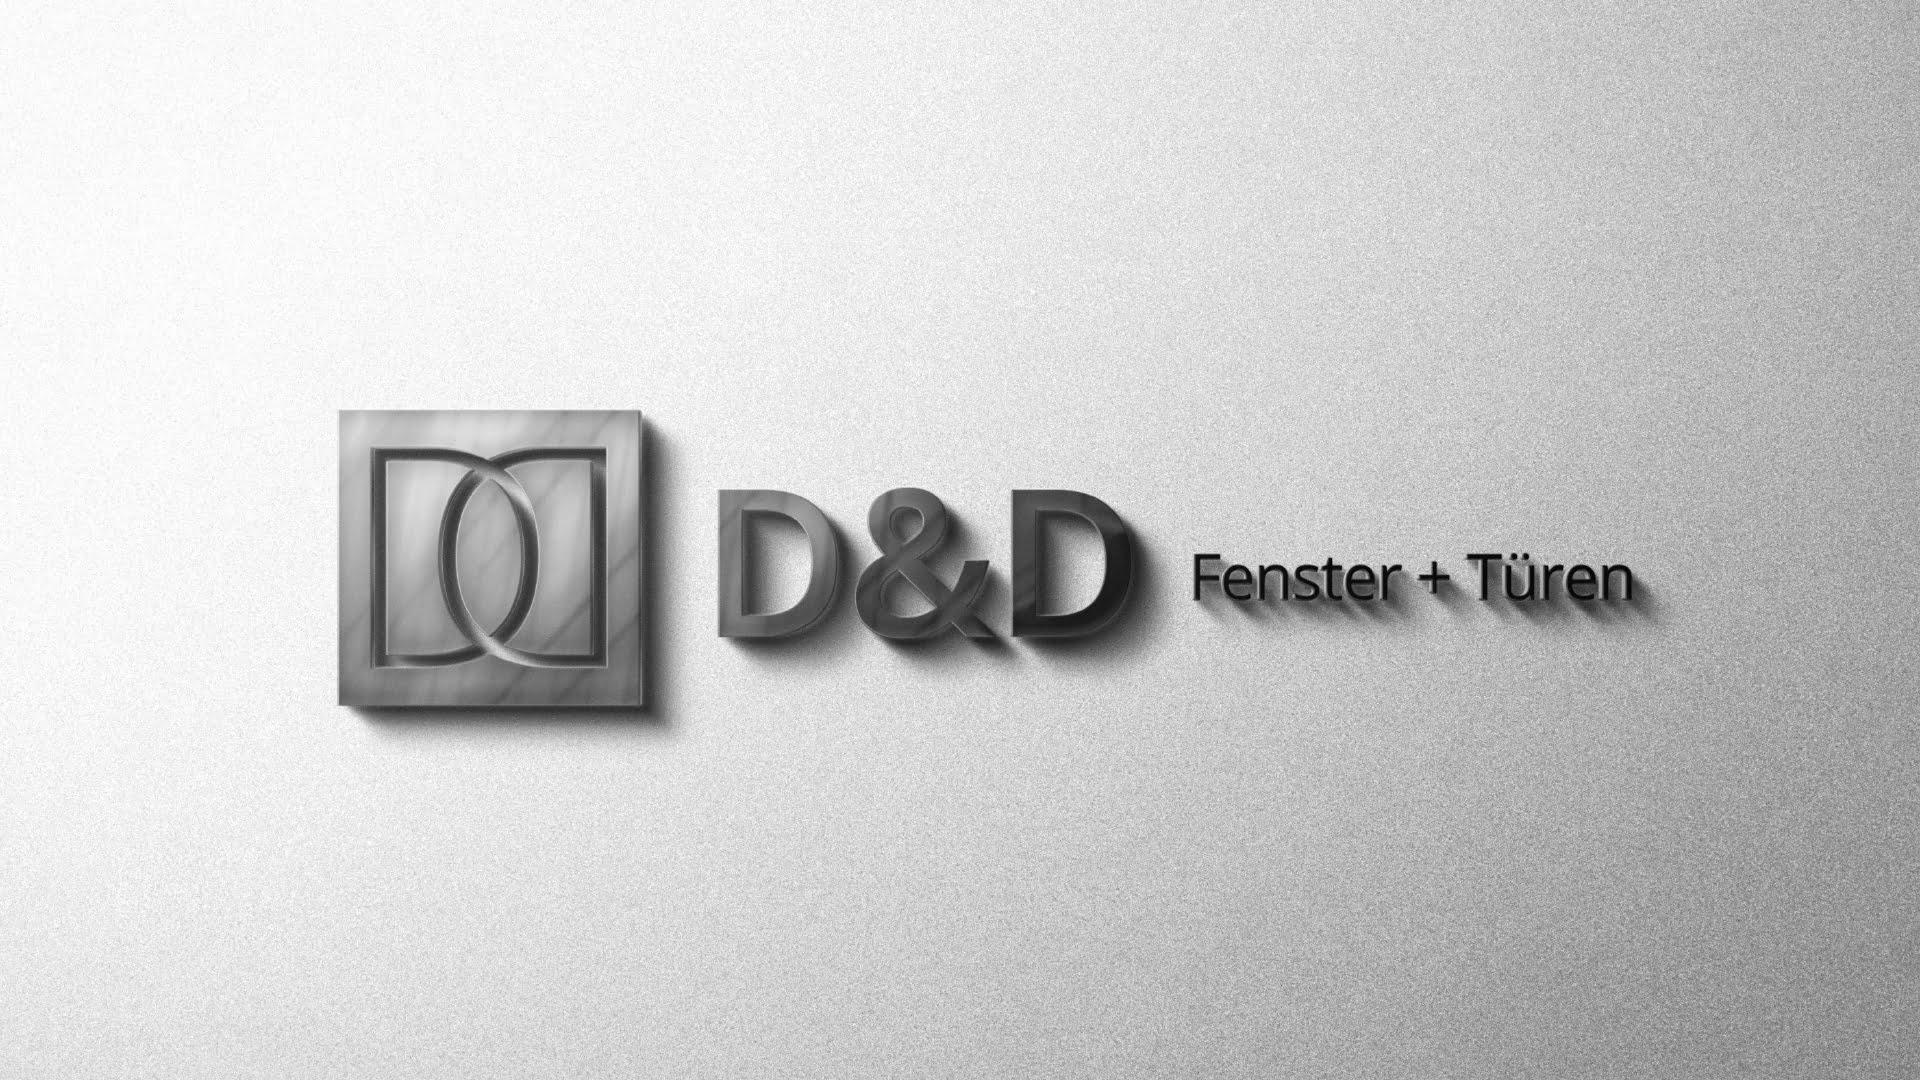 D&D Fenster & Türen